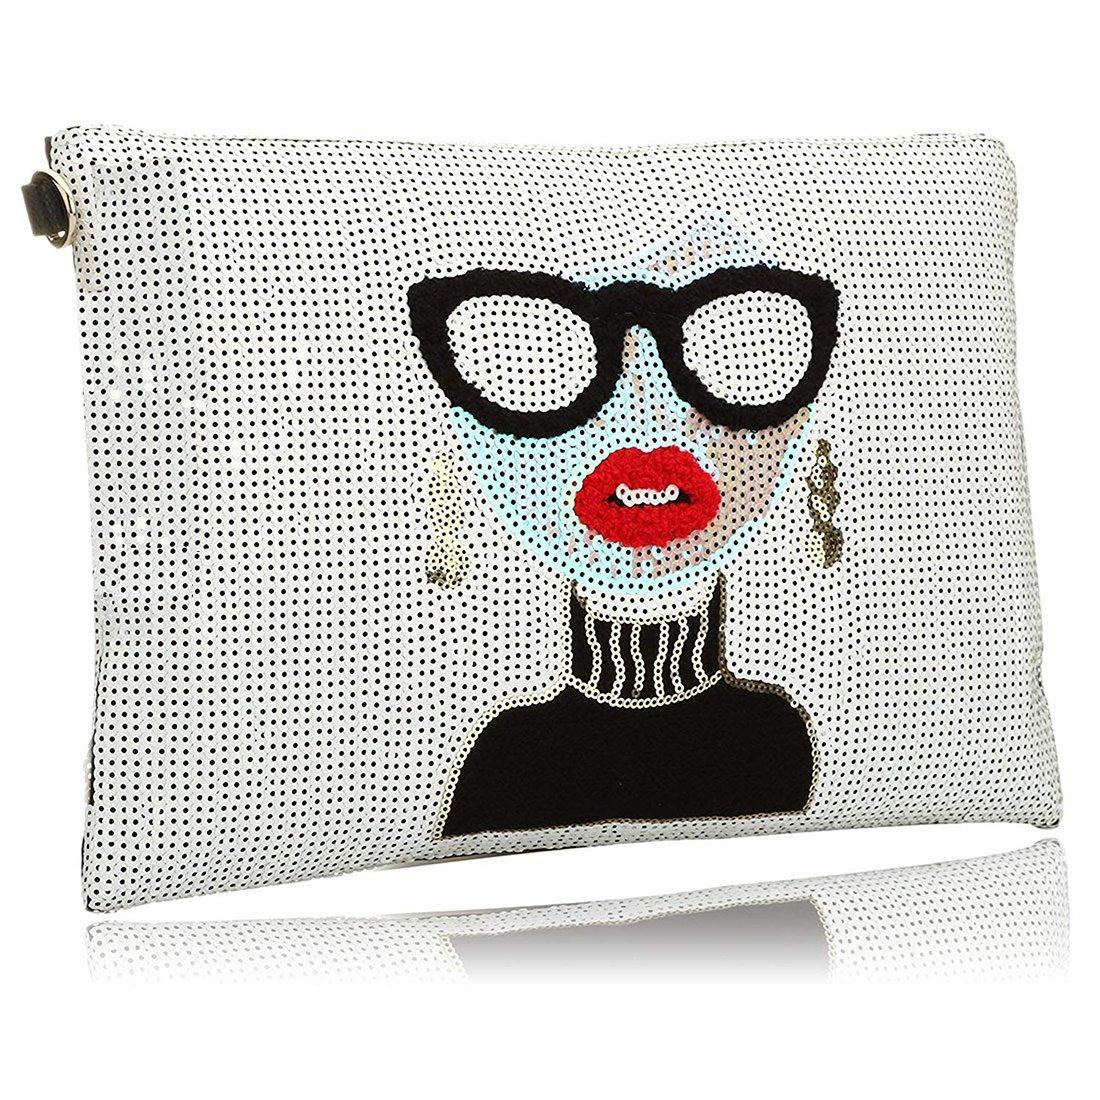 Oversized Clutch Bag Purse, Womens Large Designer leather Evening Wristlet Handbag for Ladies